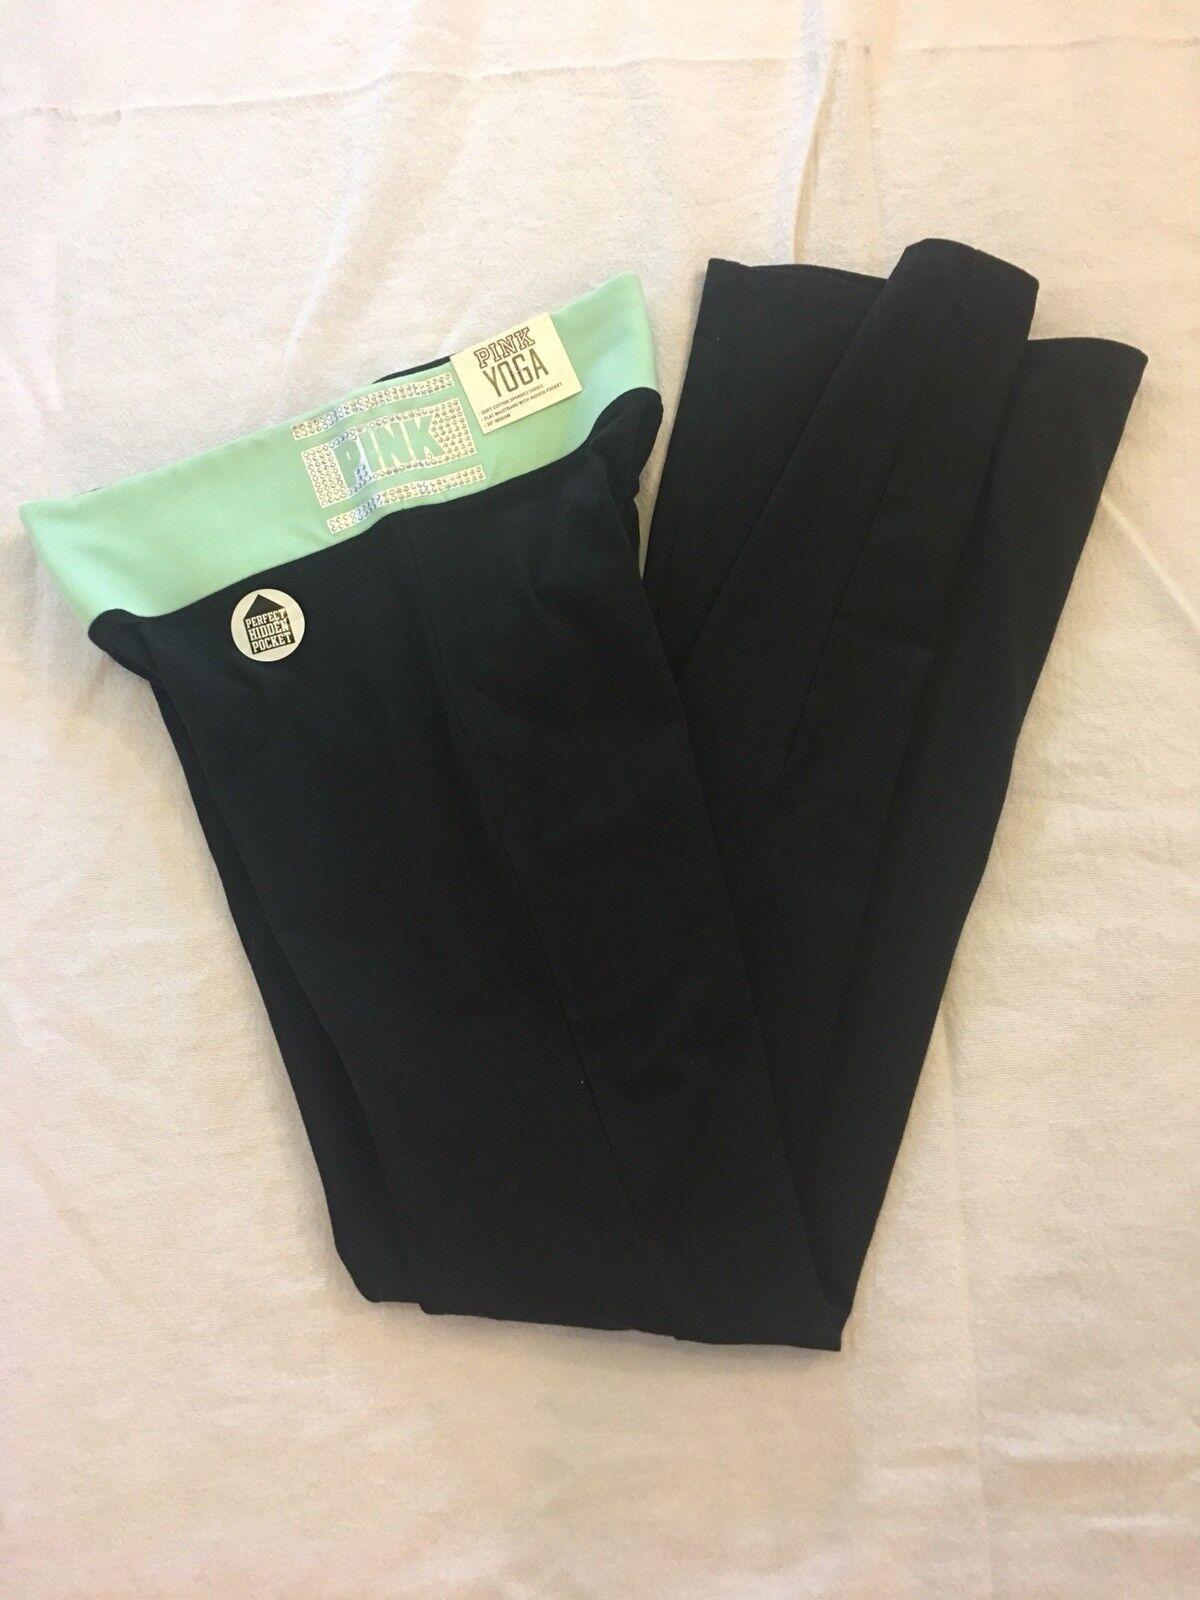 Victoria's Secret Flat Boot Yoga Pants Mint Green Rhinestone Small NWT